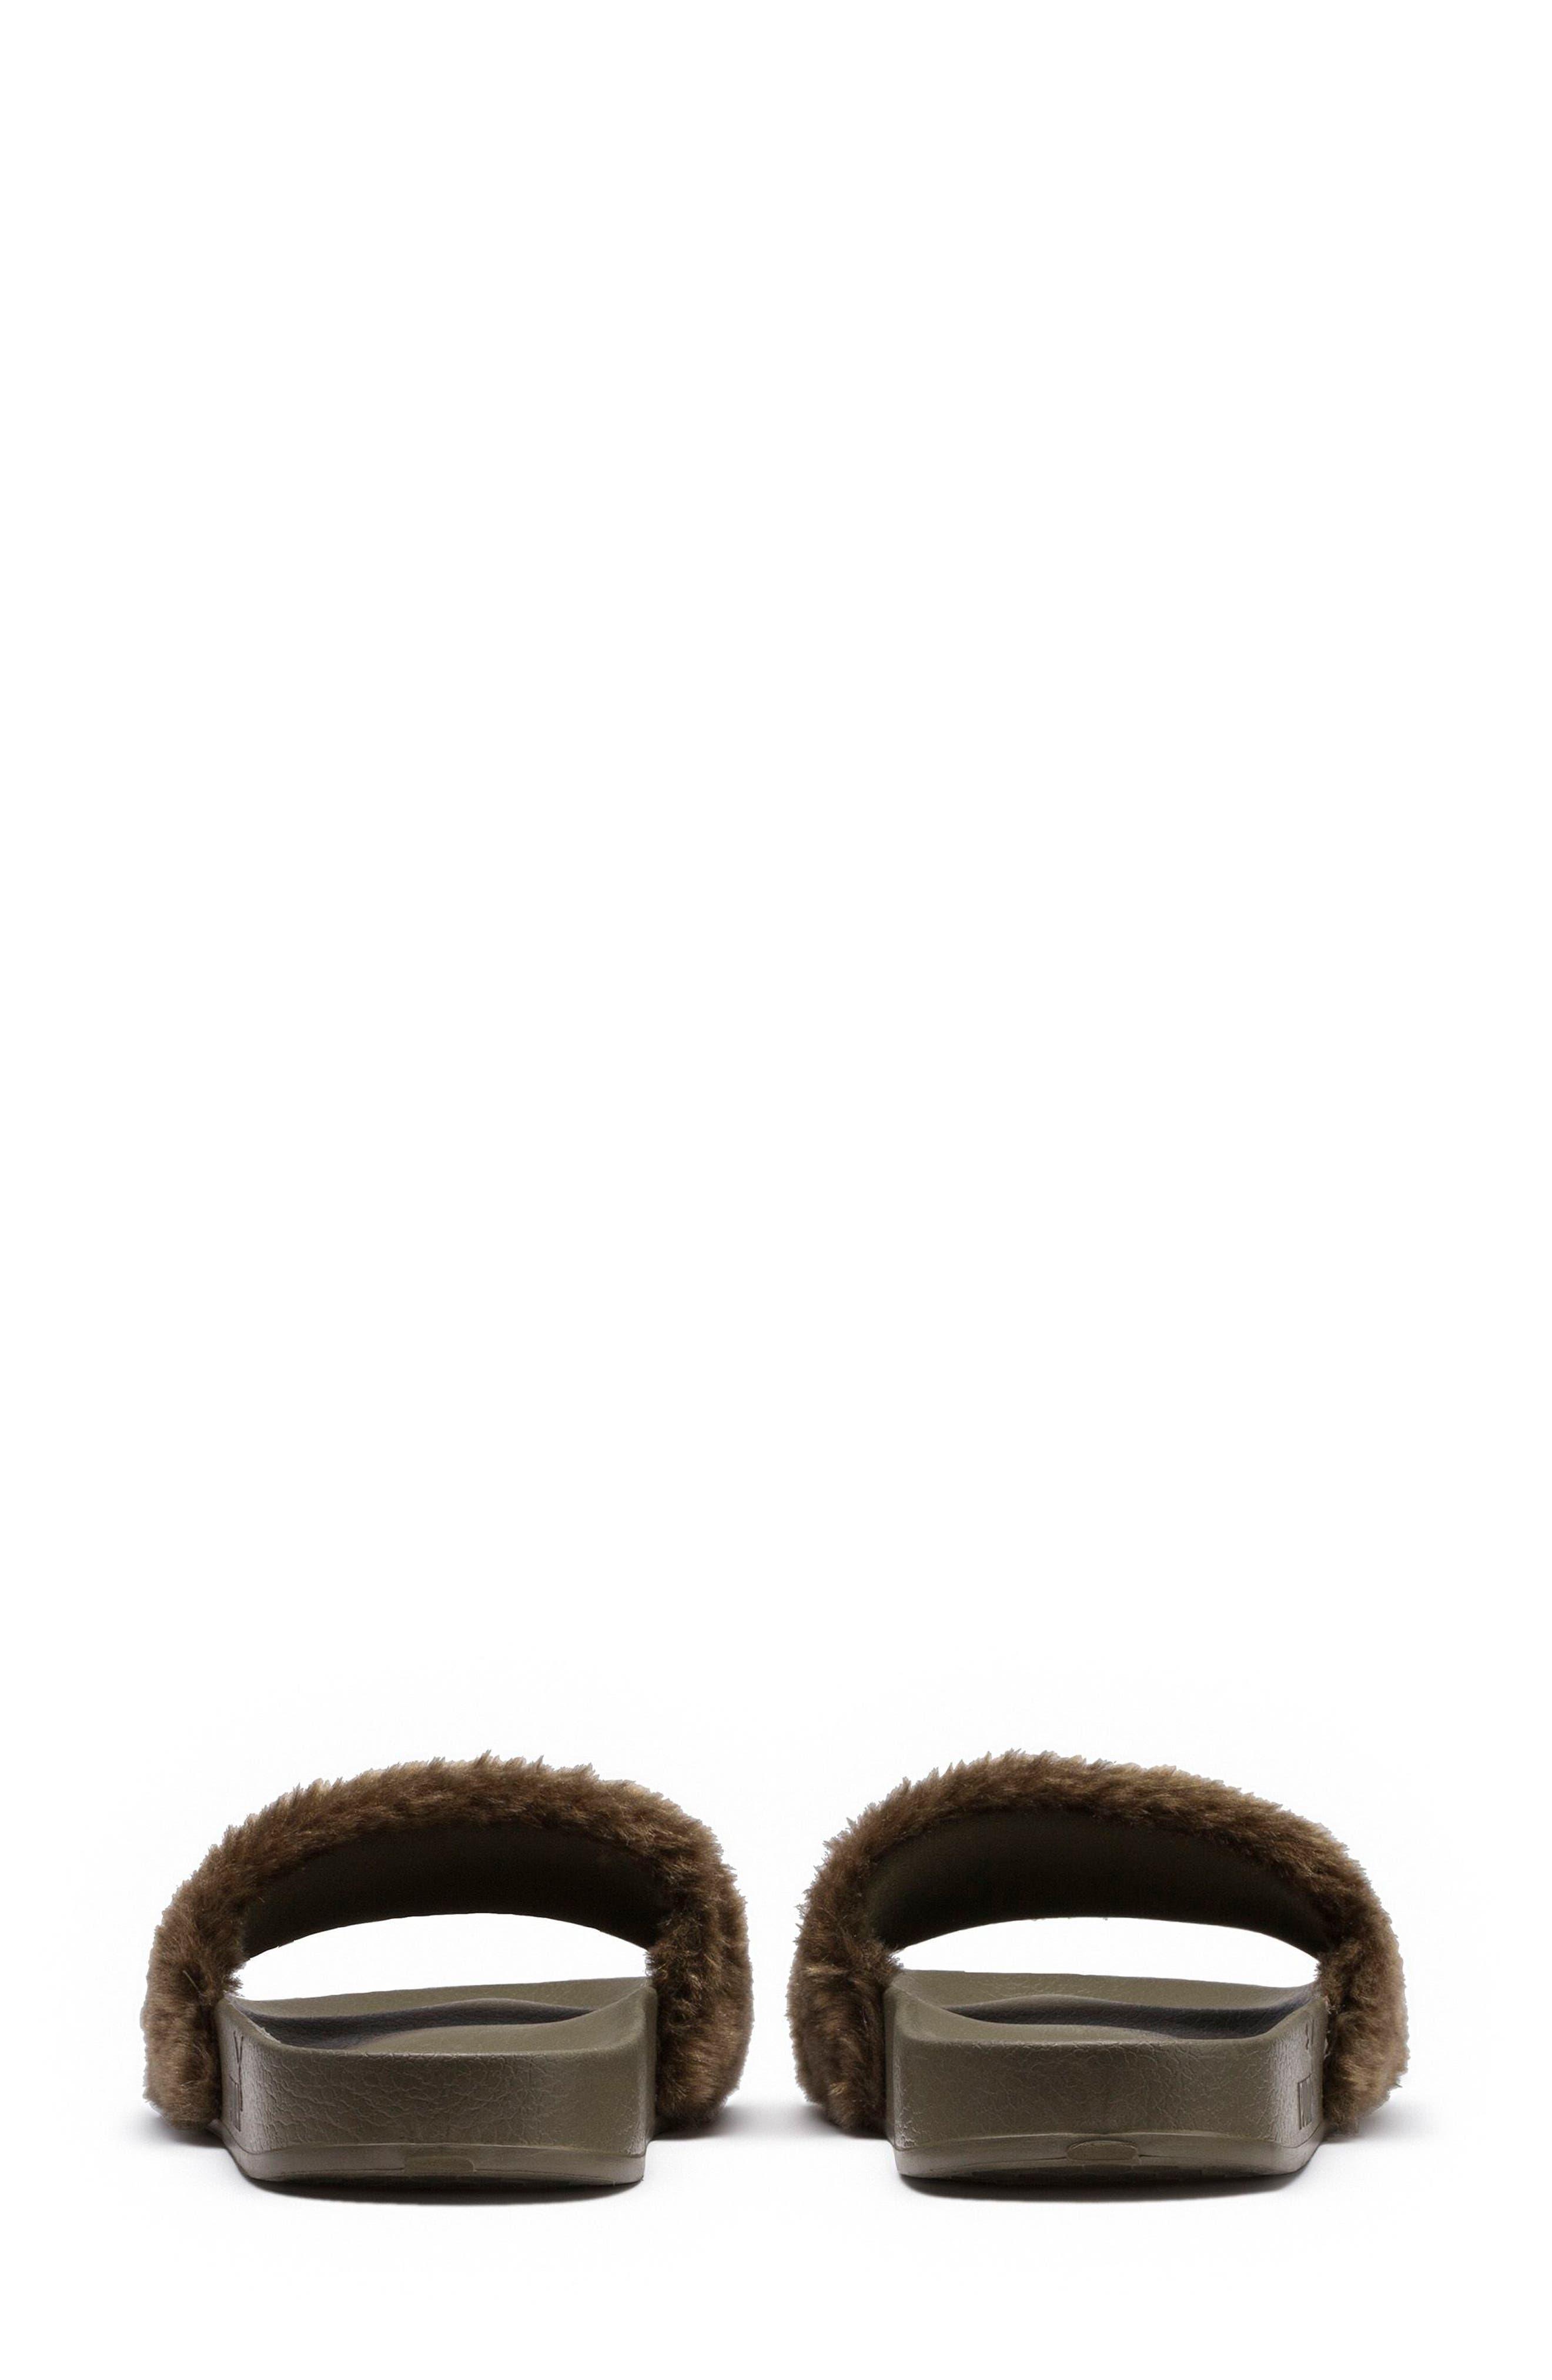 FENTY PUMA by Rihanna Lead Cat Slide Sandals,                             Alternate thumbnail 2, color,                             300